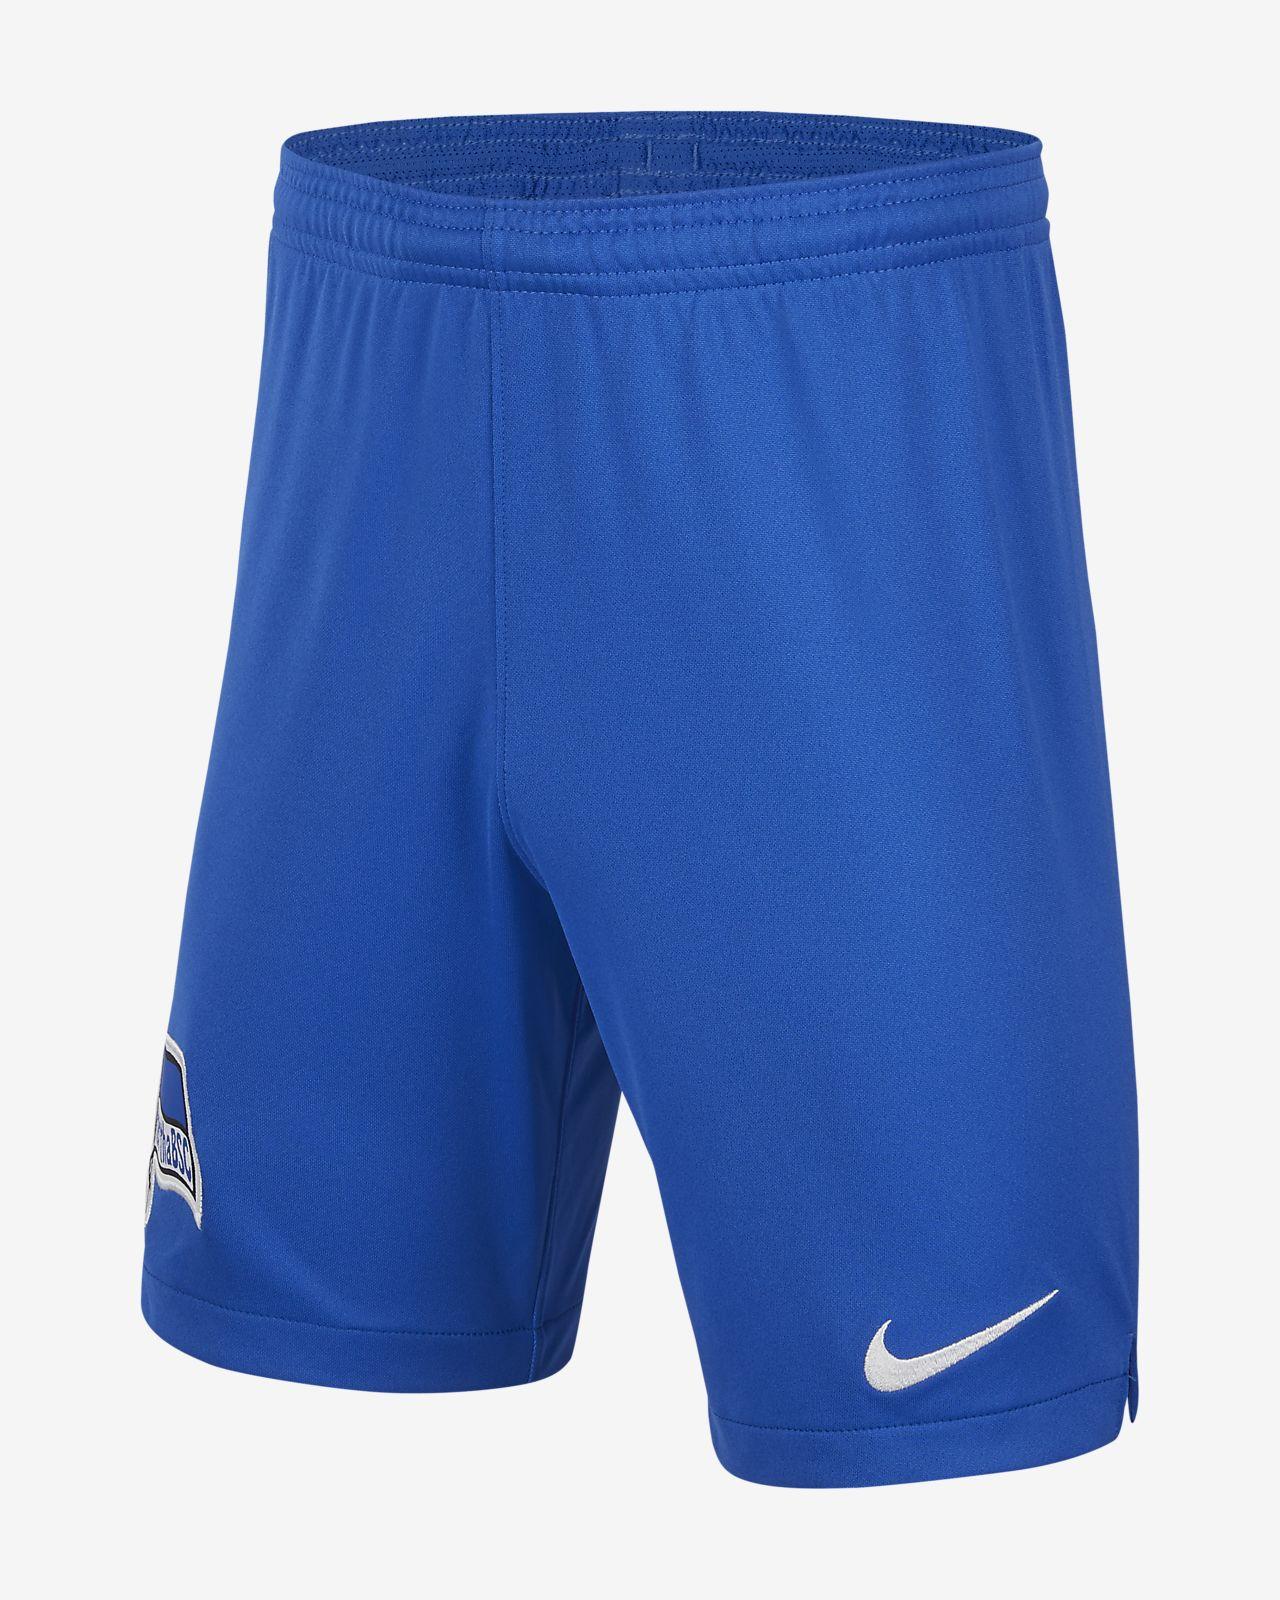 Hertha BSC 2019/20 Stadium Home Older Kids' Football Shorts